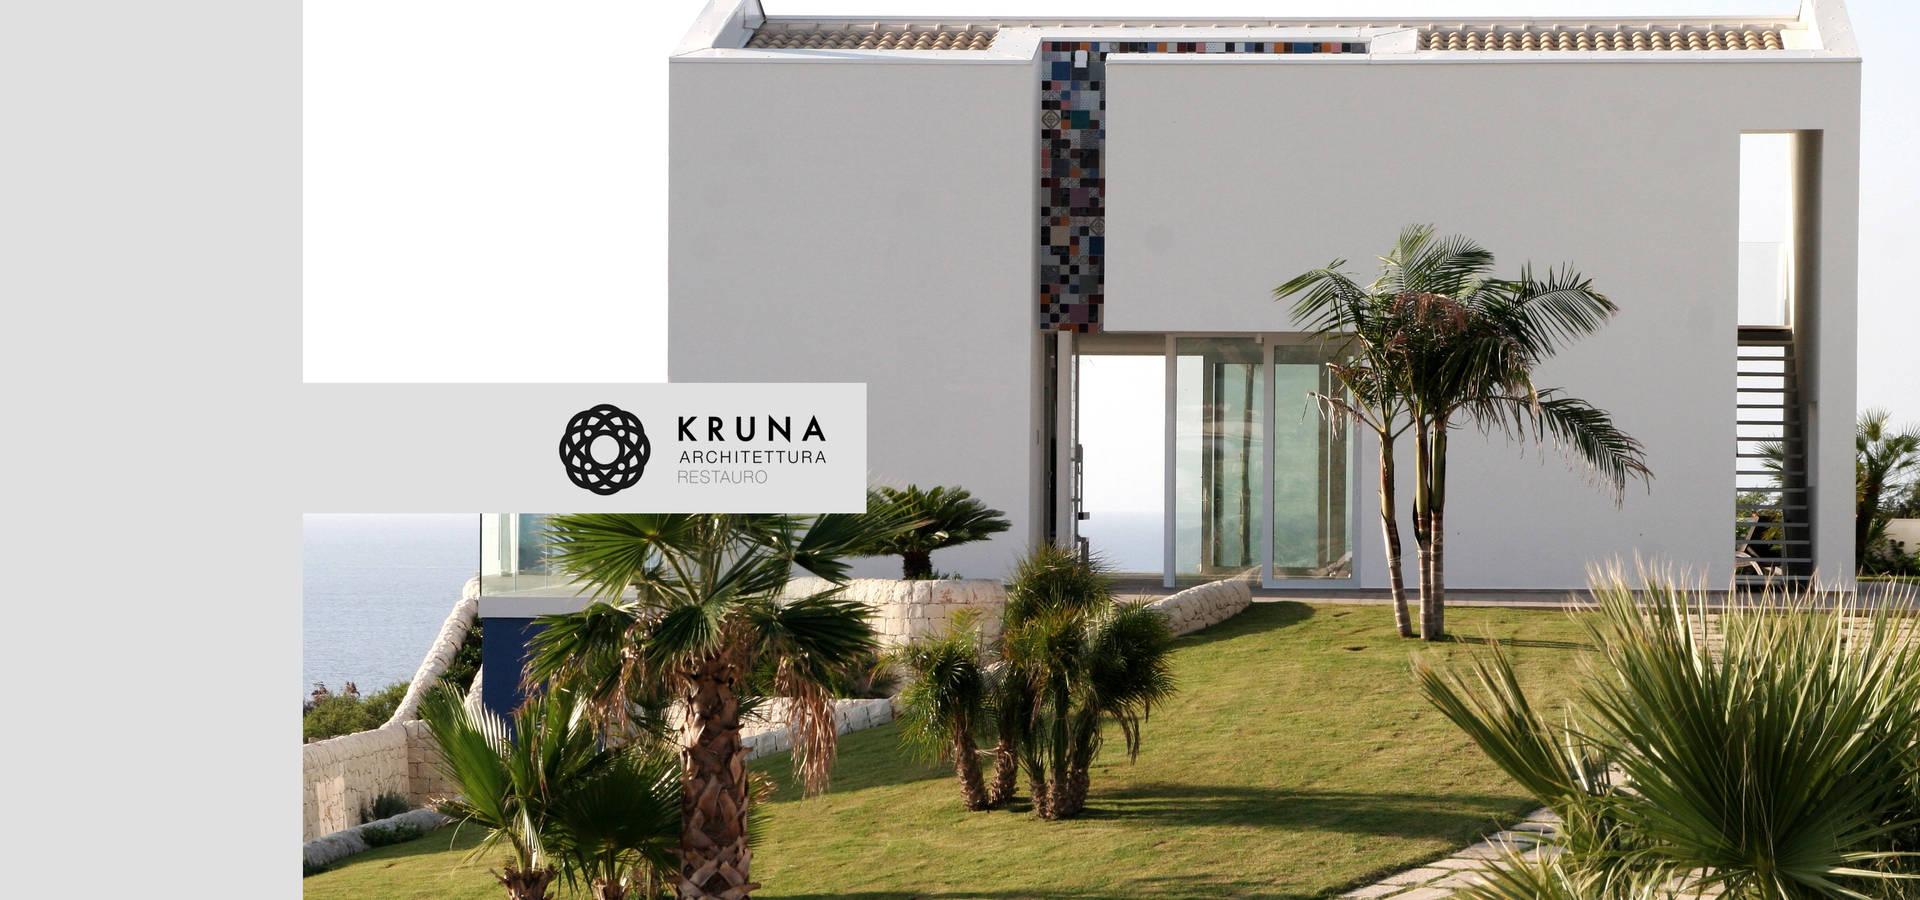 KRUNA – Architettura Restauro